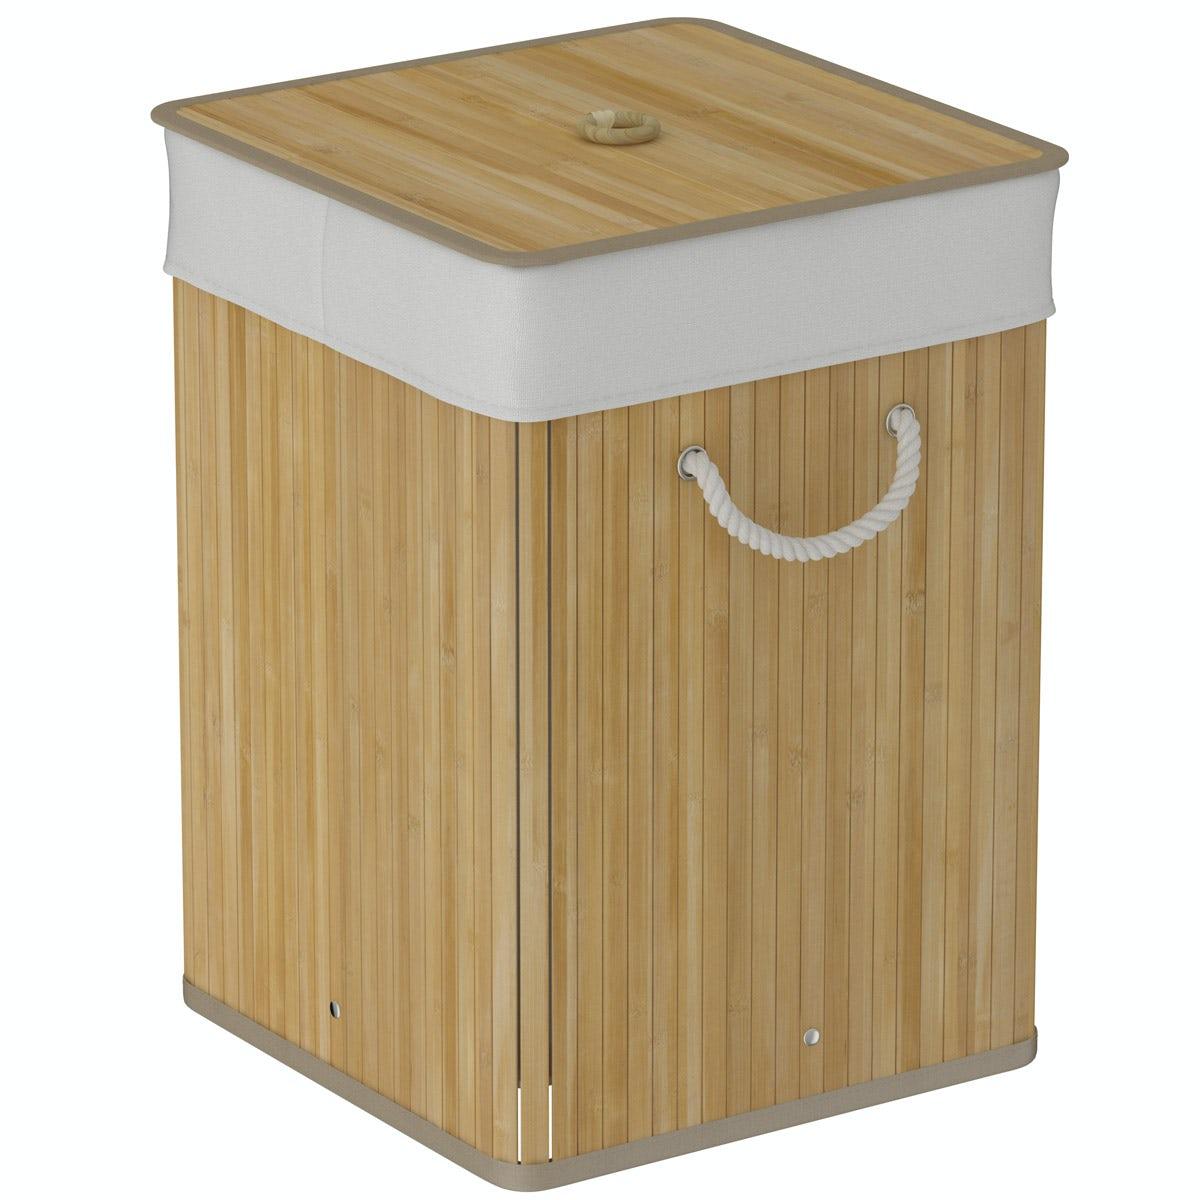 Natural bamboo square laundry basket